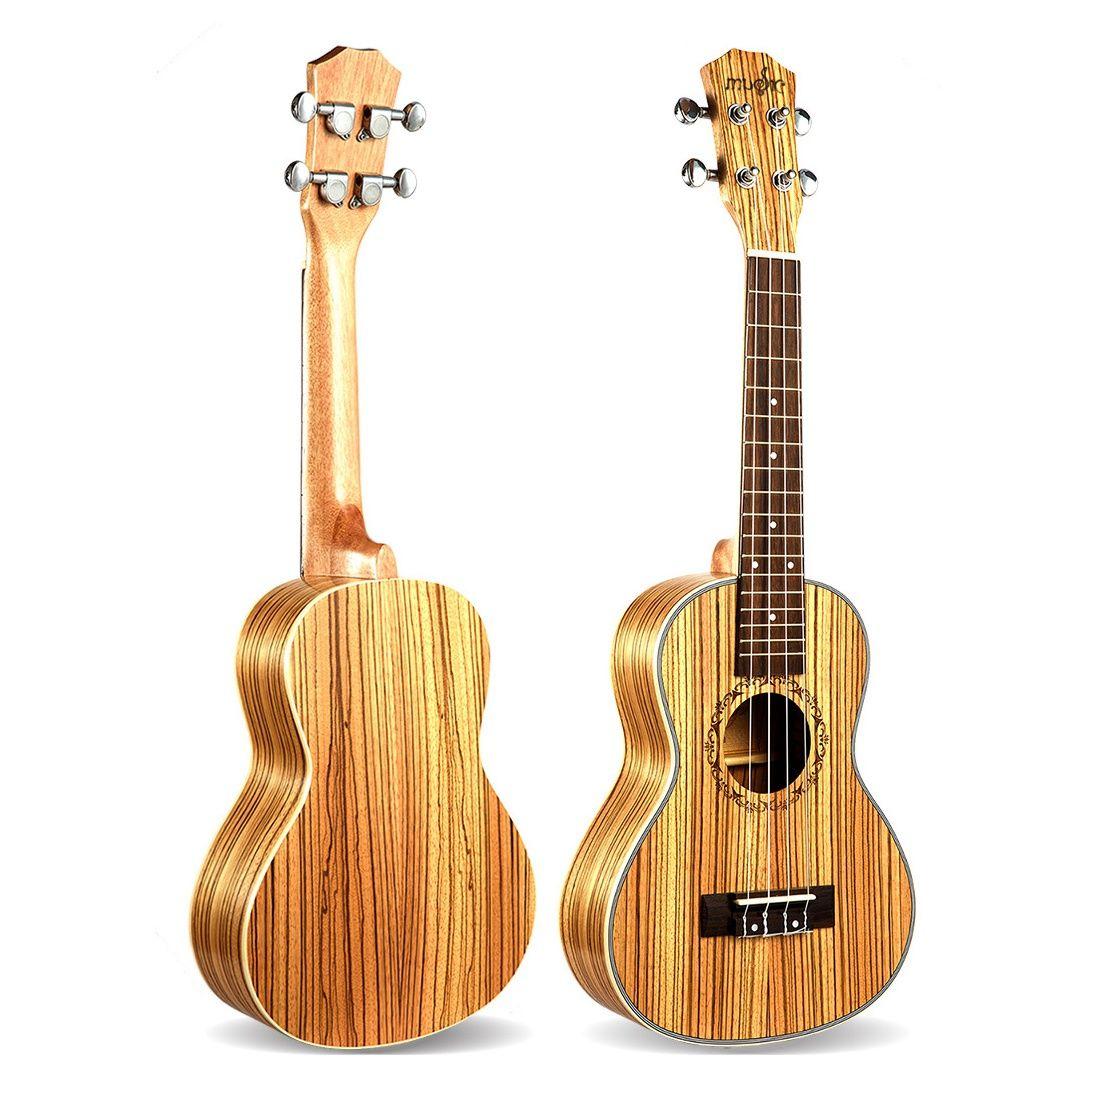 Concerto Ukulele 23 Polegada 4 Cordas Havaiano Mini Guitarra Acústica Guitarra ukelele guitarra enviar presentes Musical Instrumento De Cordas